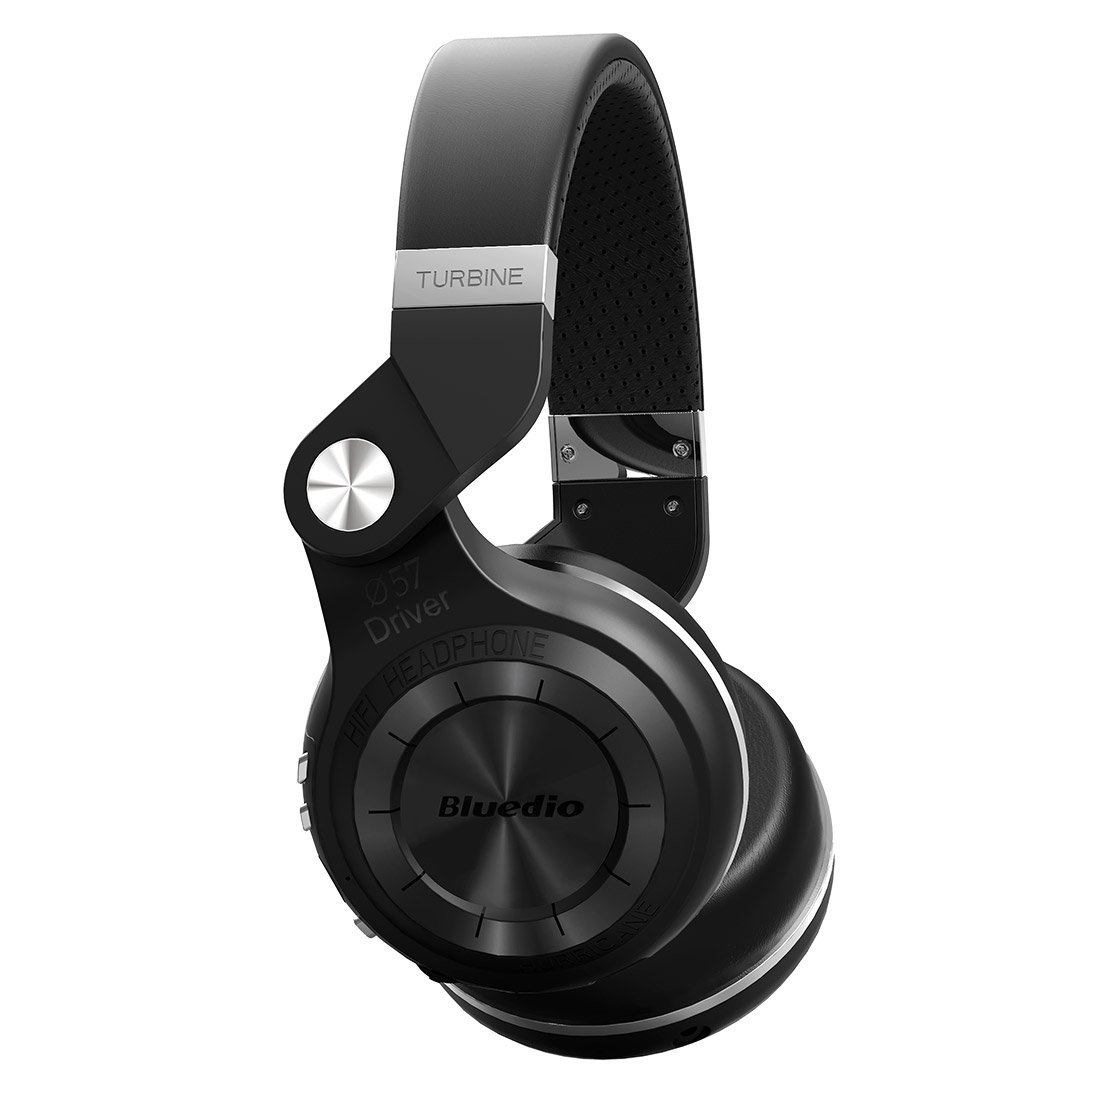 Bluedio T2 Plus Turbine Wireless Bluetooth Headphones with Mic/Micro SD Card Slot/FM Radio (Black) by Bluedio